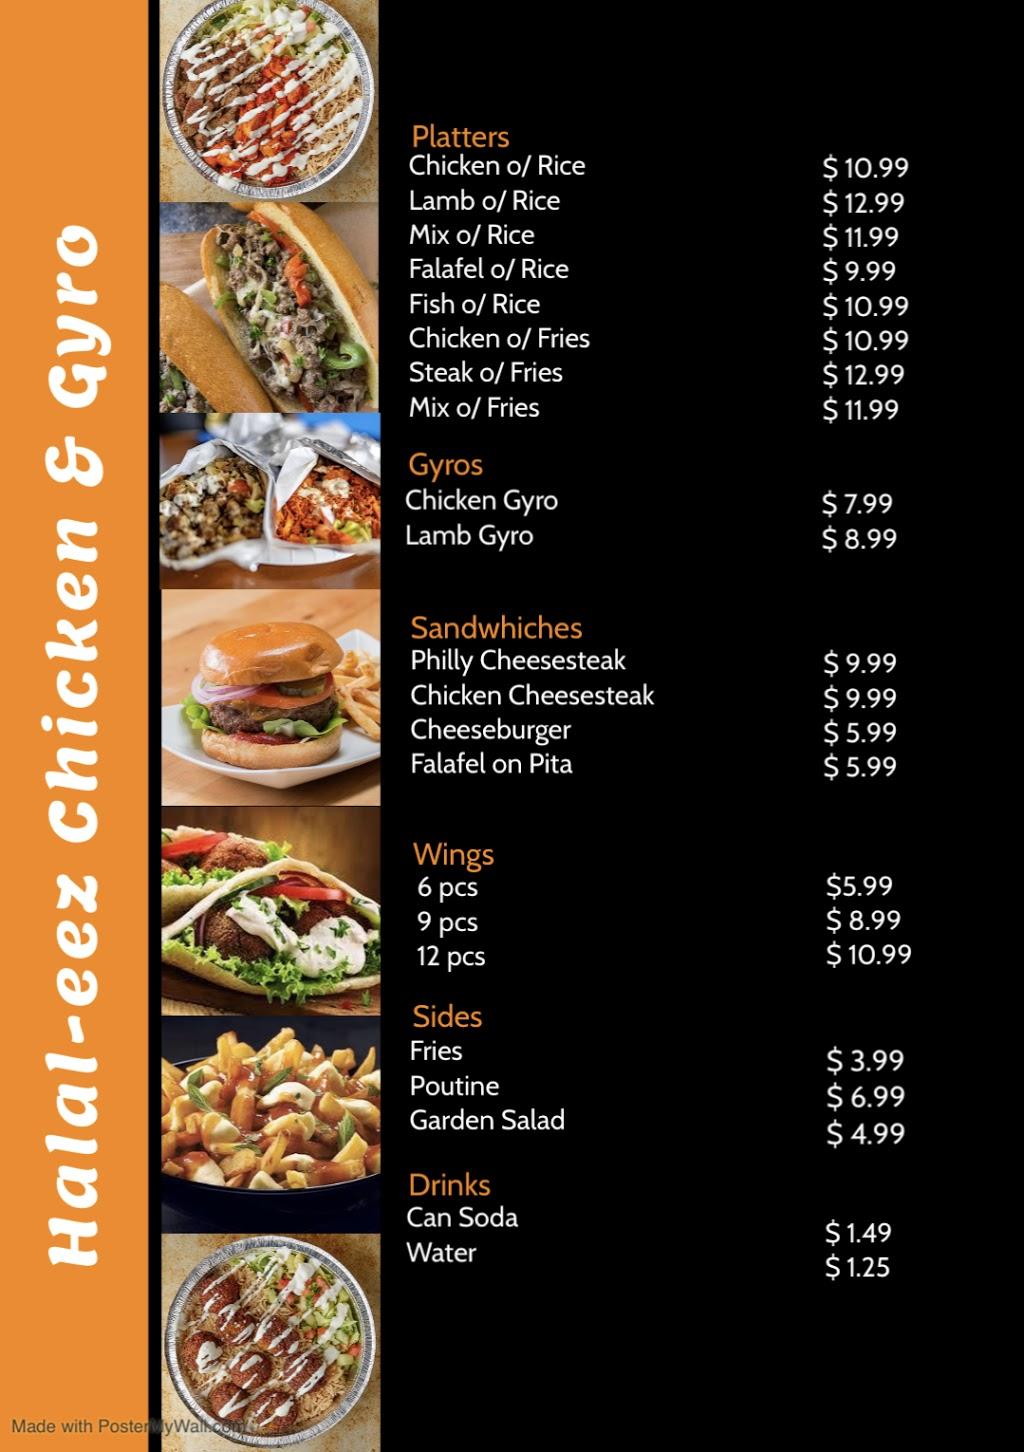 Halaleez Chicken & Gyro | restaurant | 266 Symington Ave, Oshawa, ON L1H 7K4, Canada | 6477038900 OR +1 647-703-8900